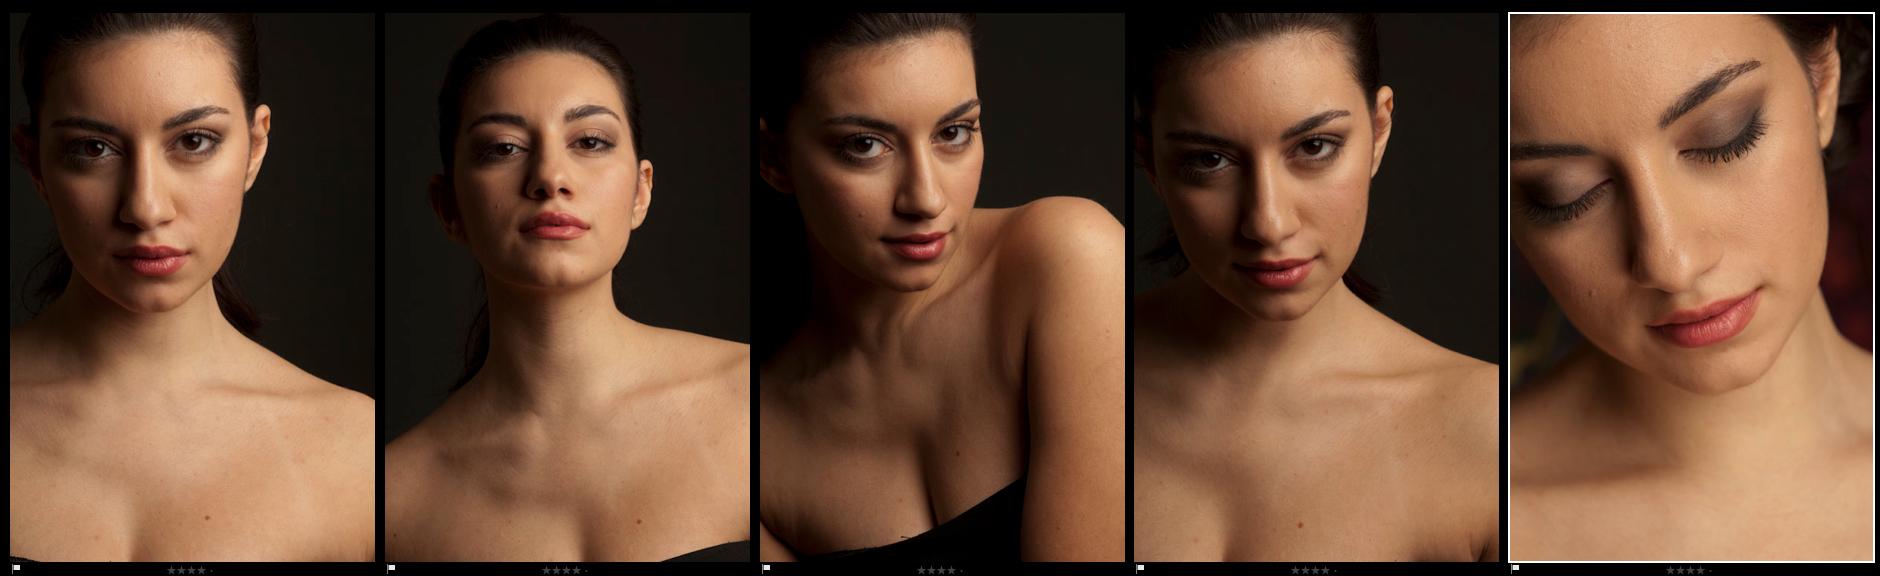 dc photographer, dc MUA, cedric terrell photography, gina robinson, beauty